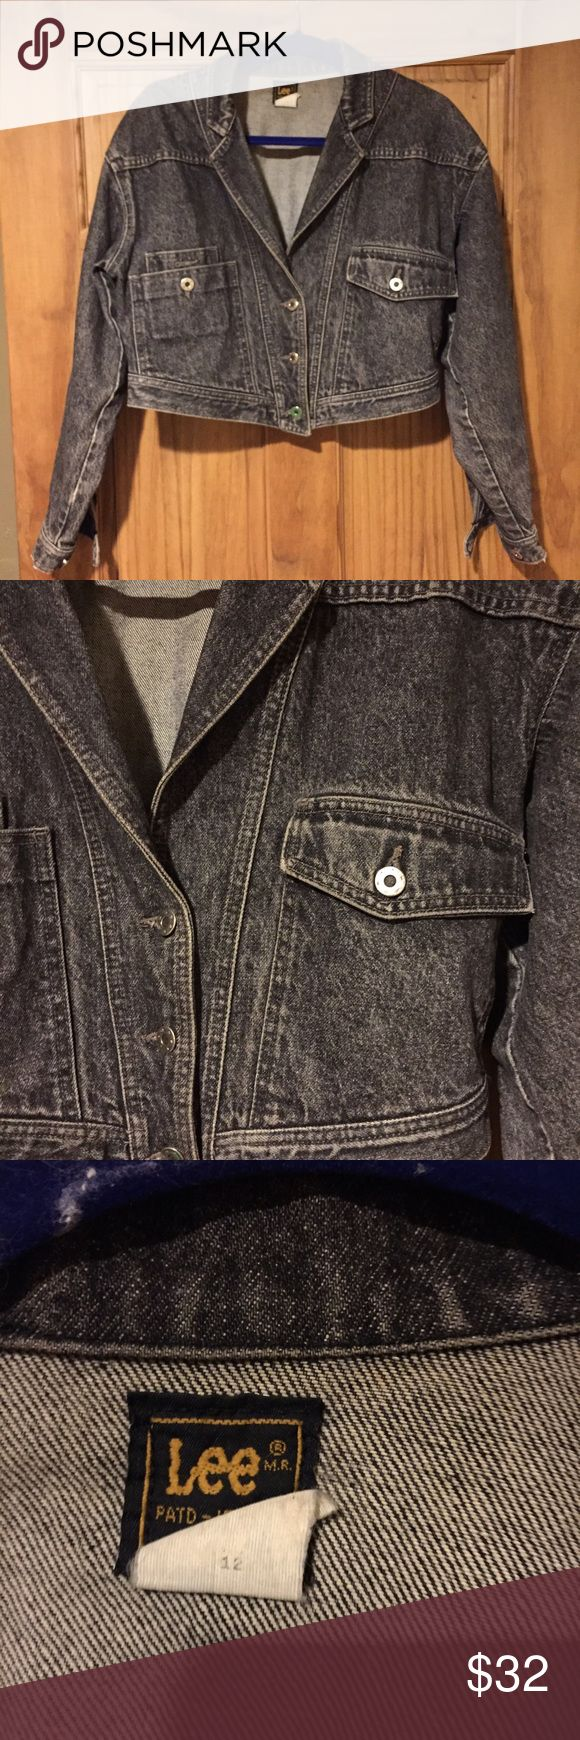 Lee vintage stonewash denim jacket size medium Stonewash gray denim jacket slightly cropped two pockets in front button up very 90s size medium great condition Lee Jackets & Coats Jean Jackets